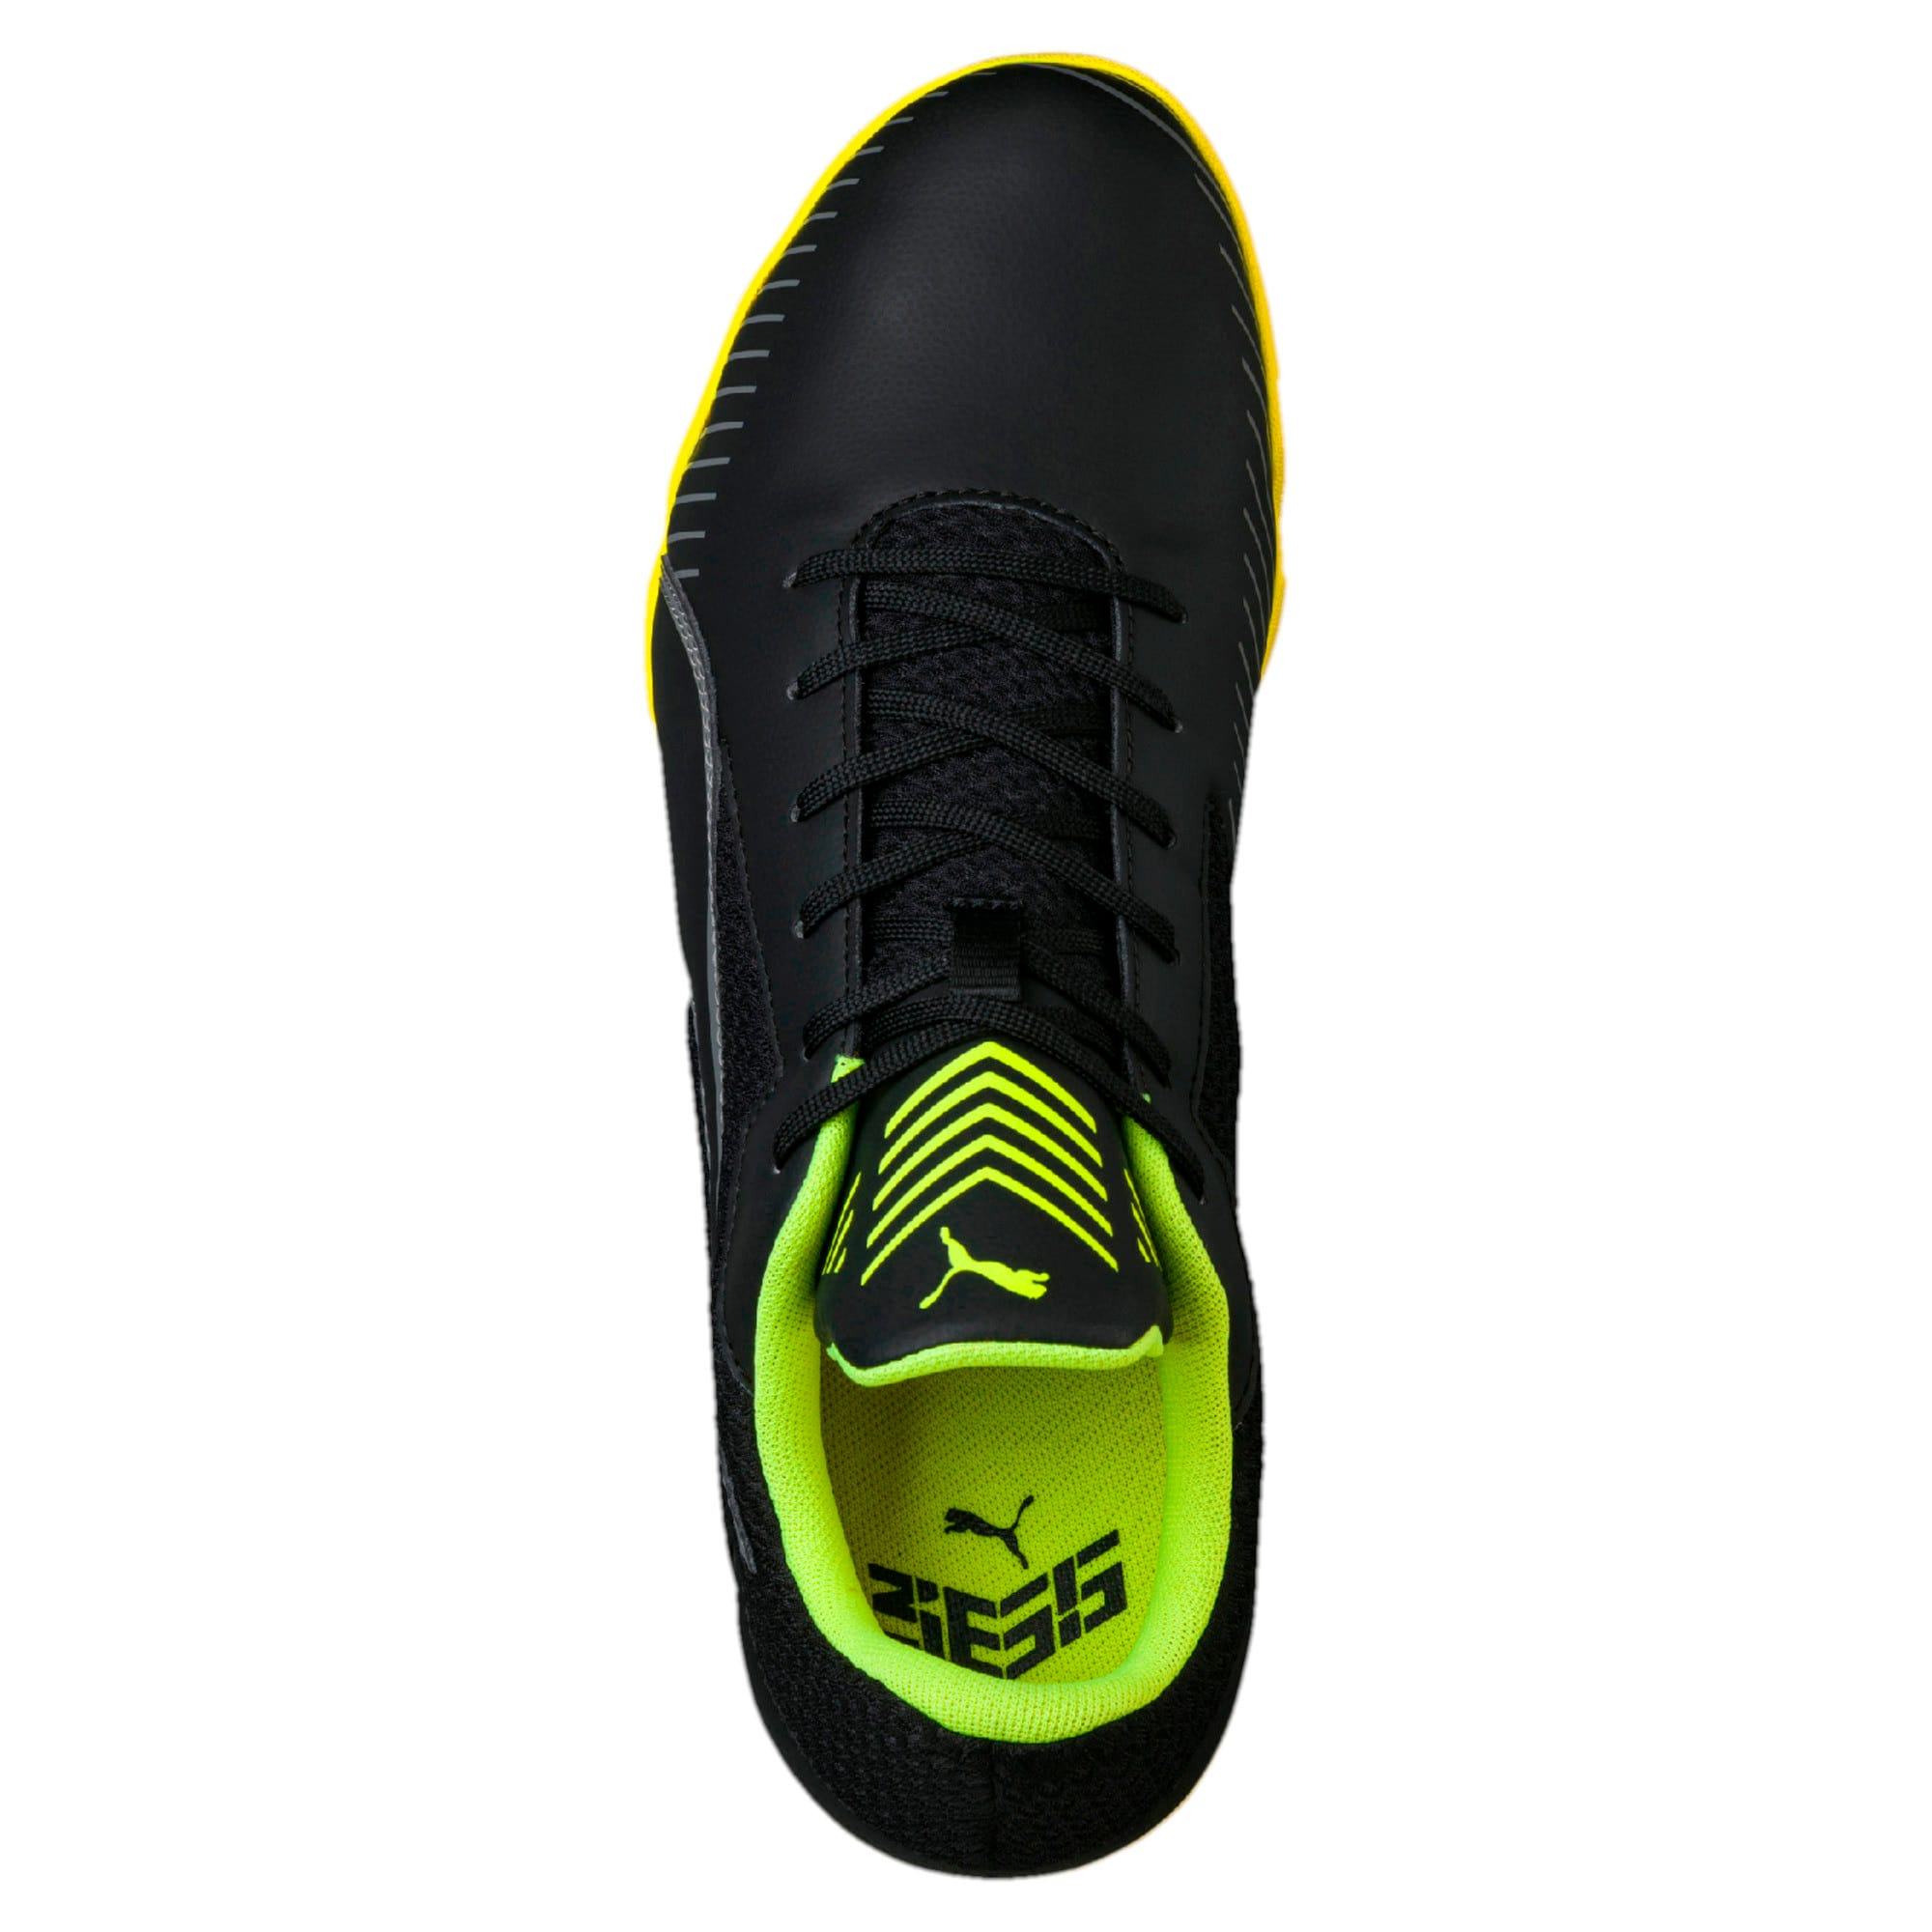 Thumbnail 4 of 365 CT Men's Court Football Shoes, Black-Black-Yellow-White, medium-IND